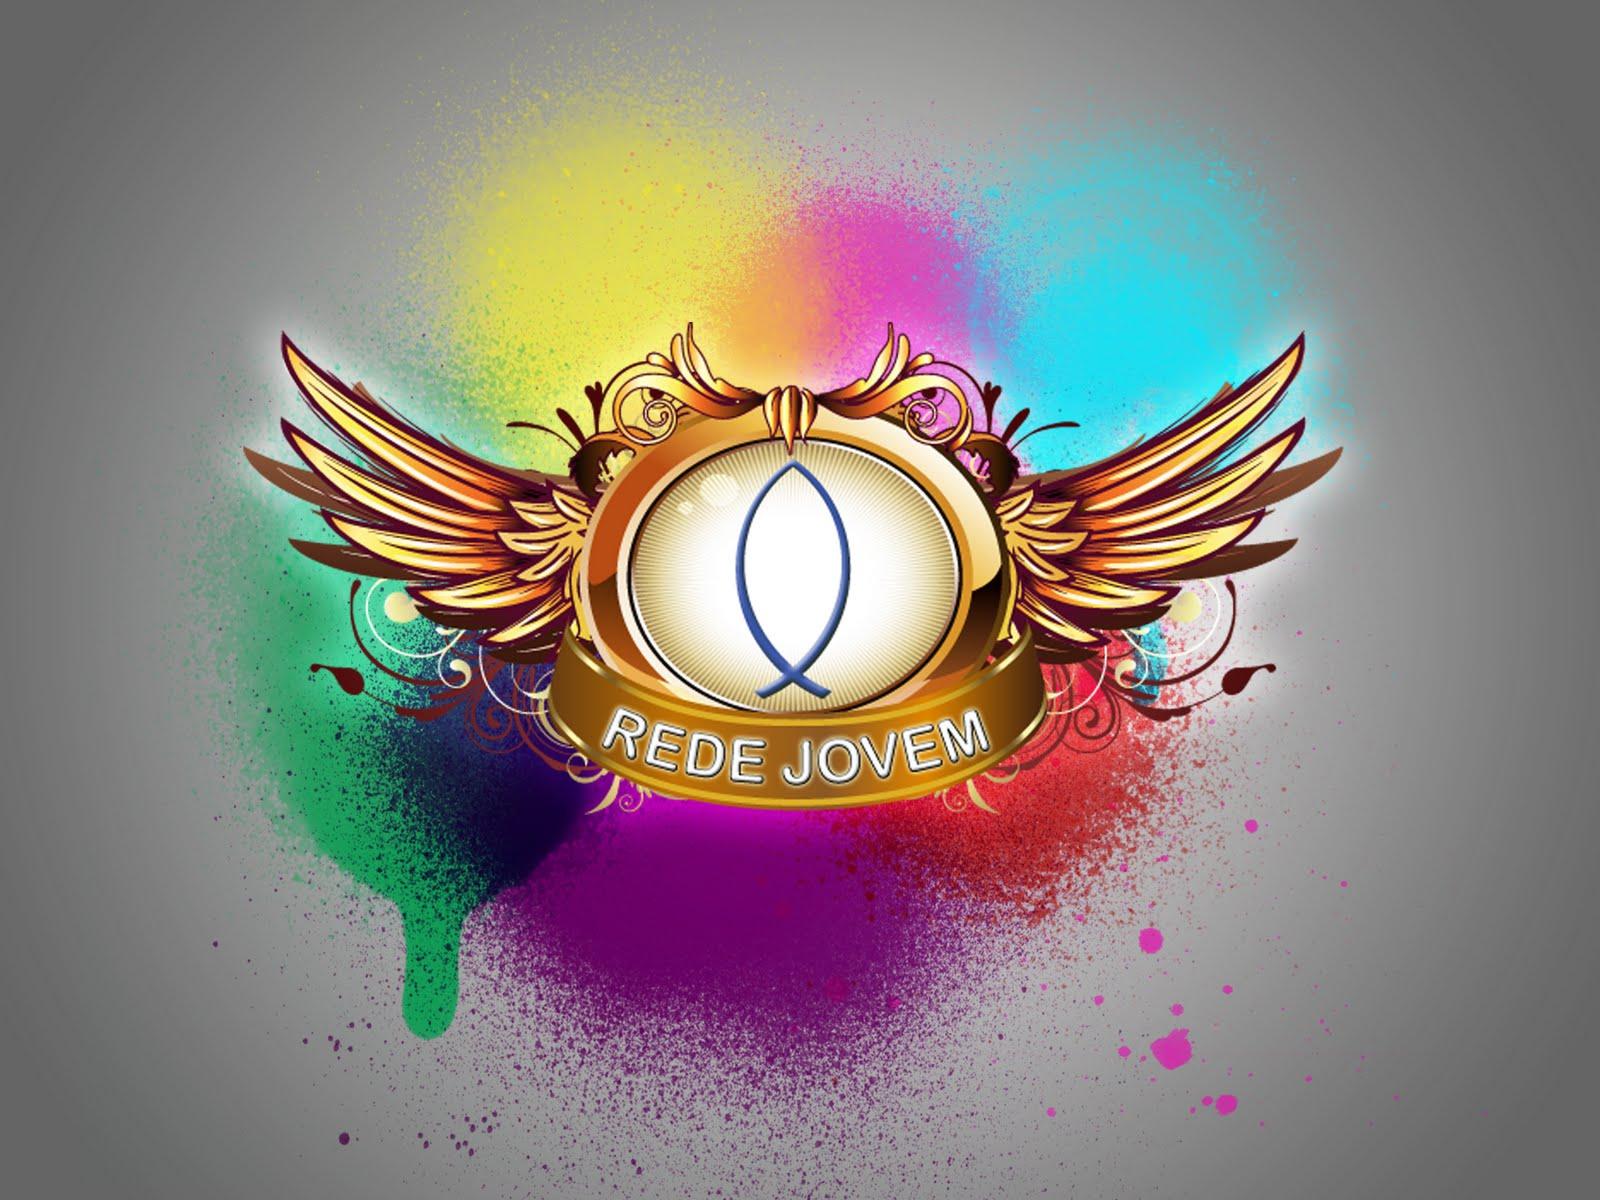 http://3.bp.blogspot.com/-U_gYtdb-Ce8/ThTQZ1ueBCI/AAAAAAAAAZE/BnrKQ2kw_UQ/s1600/Wallpaper+REde+Jovens+Spray.jpg